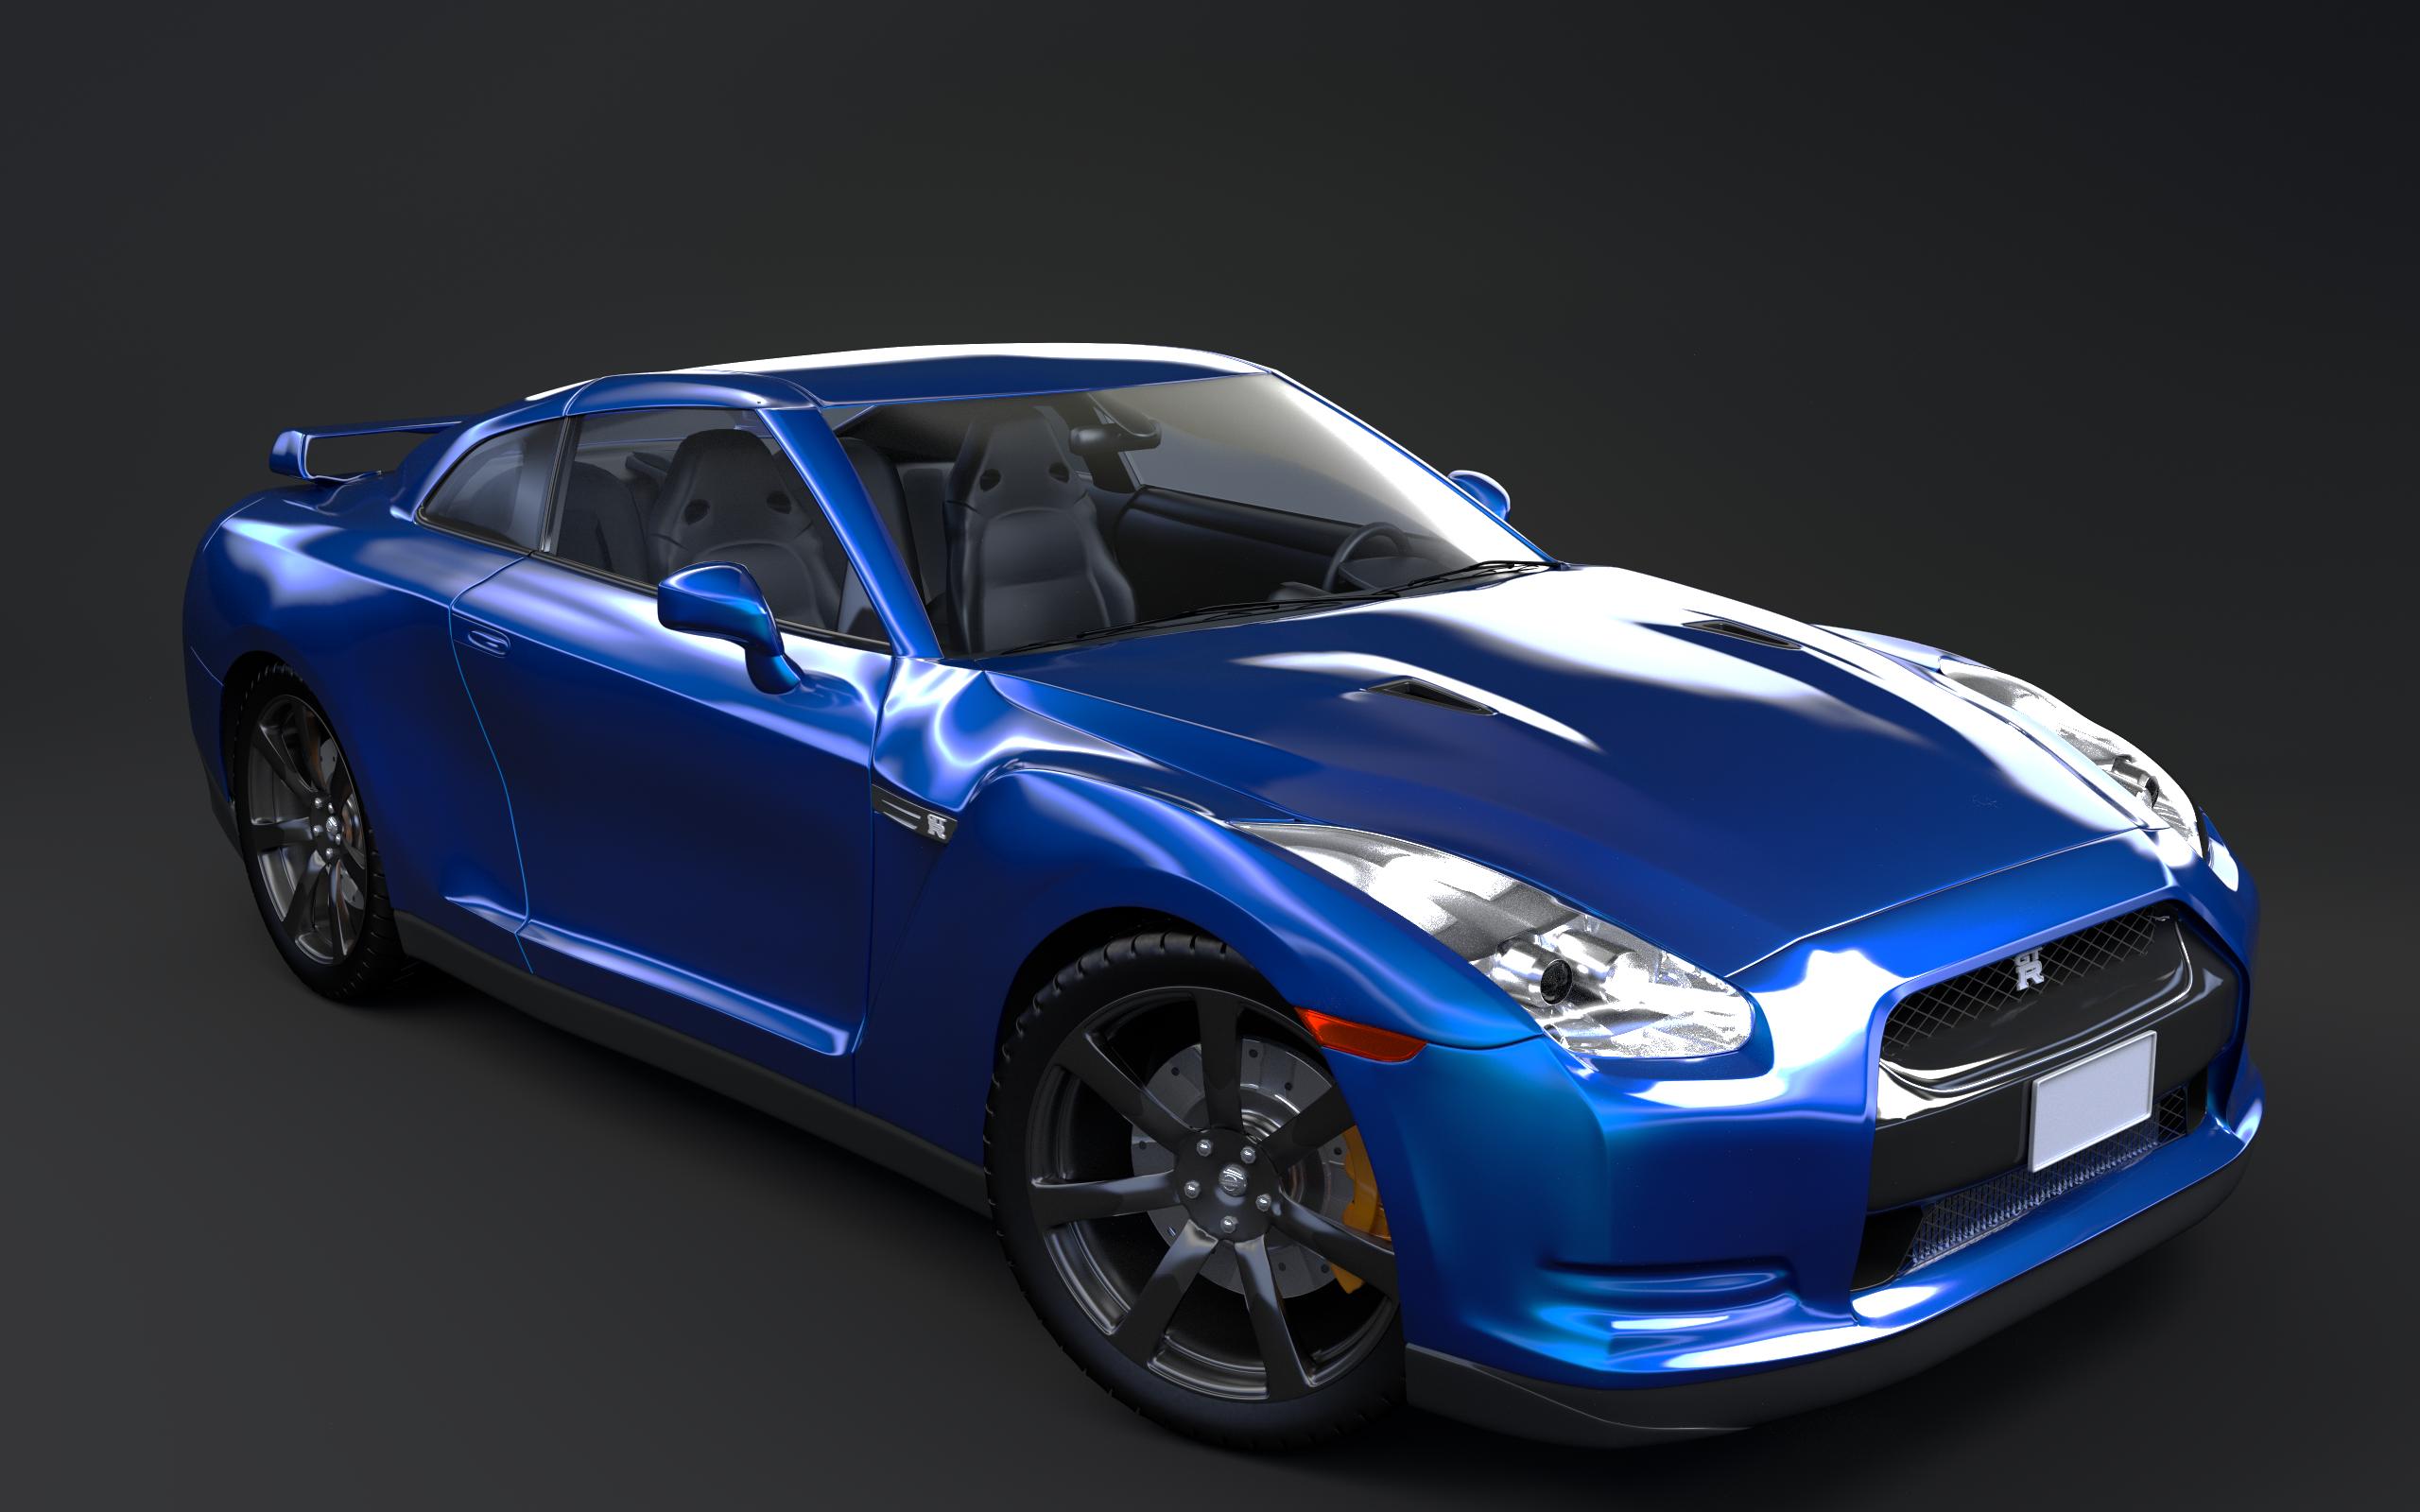 Nissan Gtr Blue By Olotocolo On Deviantart